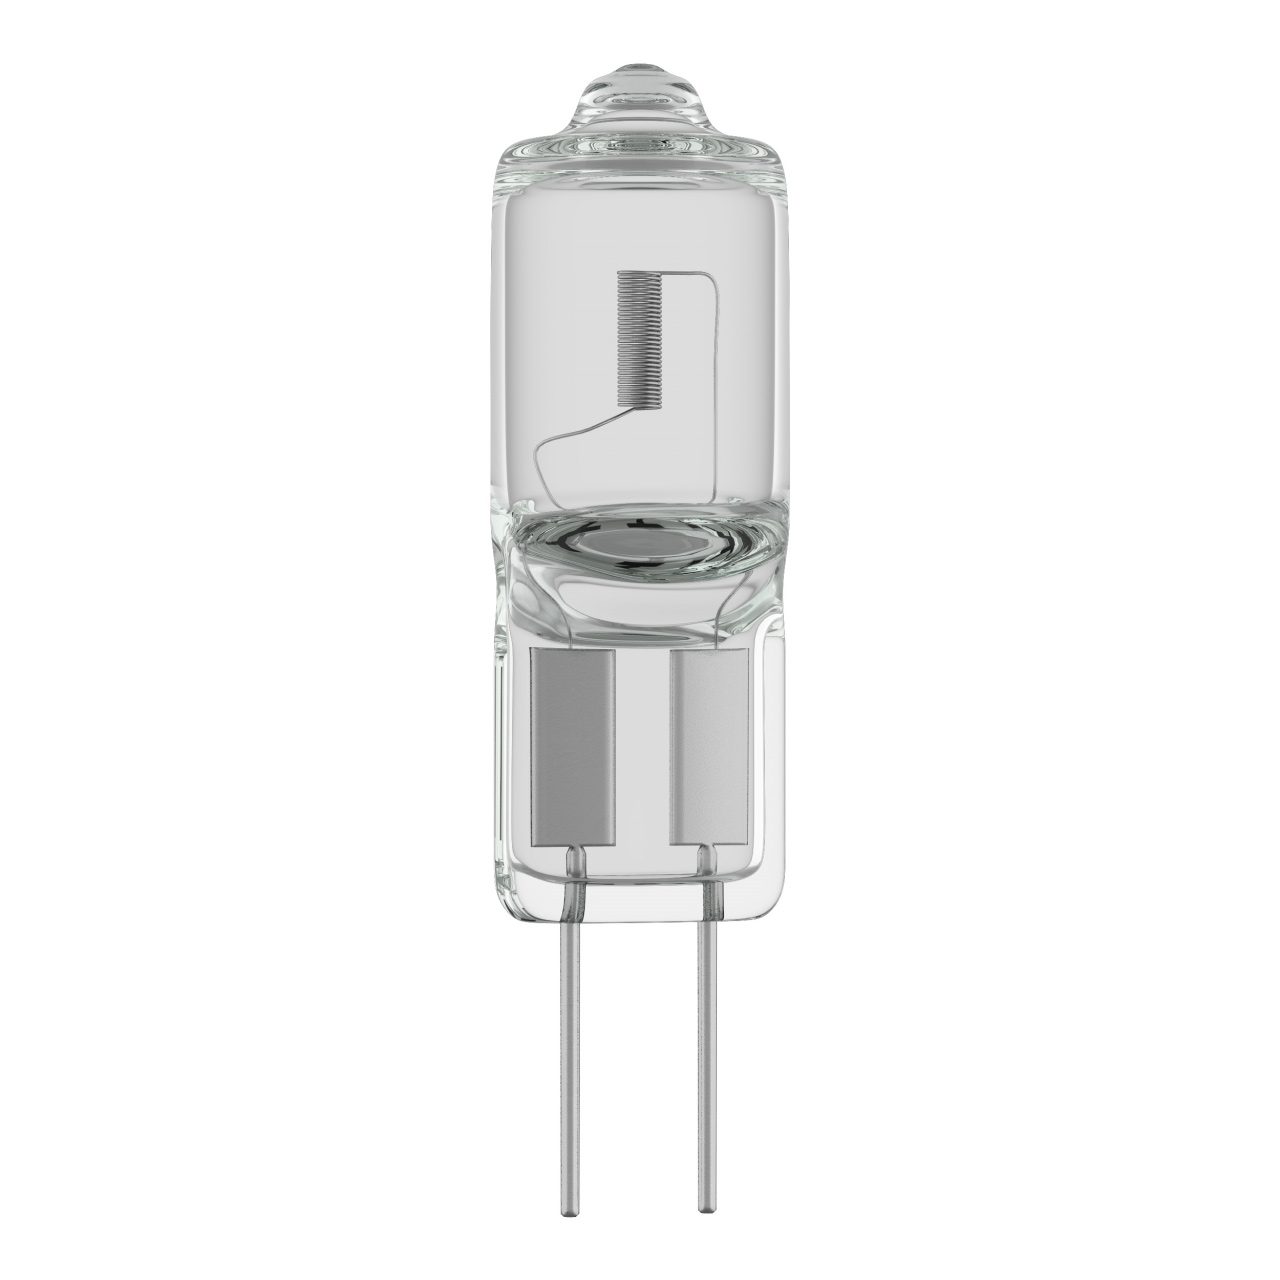 Лампа HAL 12V JC G4 20W RA100 2800K 2000H DIMM Lightstar 921022